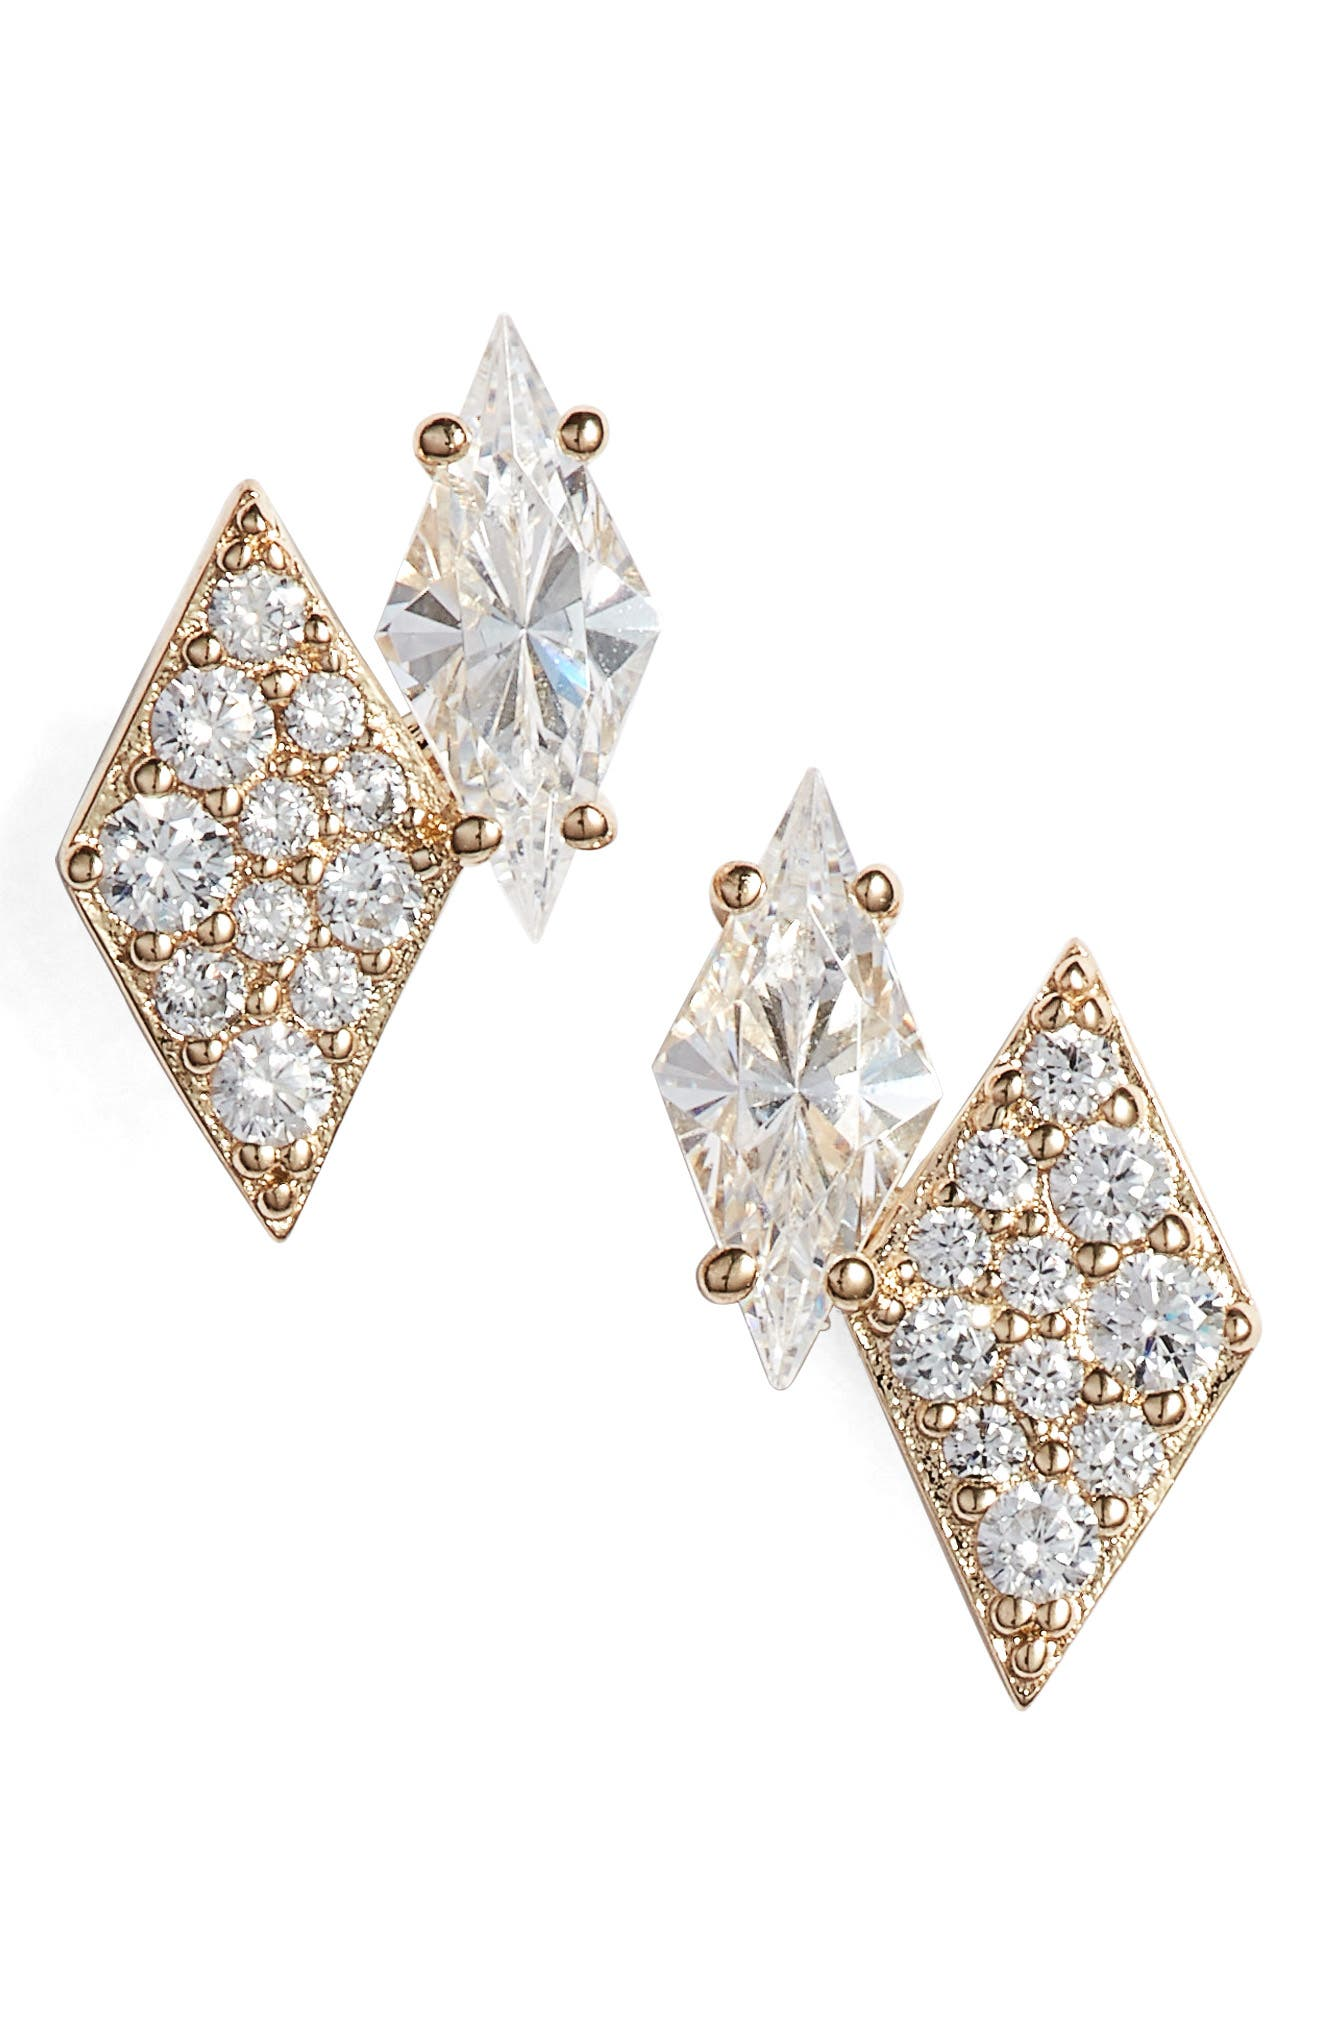 NADRI Luminous Crystal Double Diamond Earrings in Gold